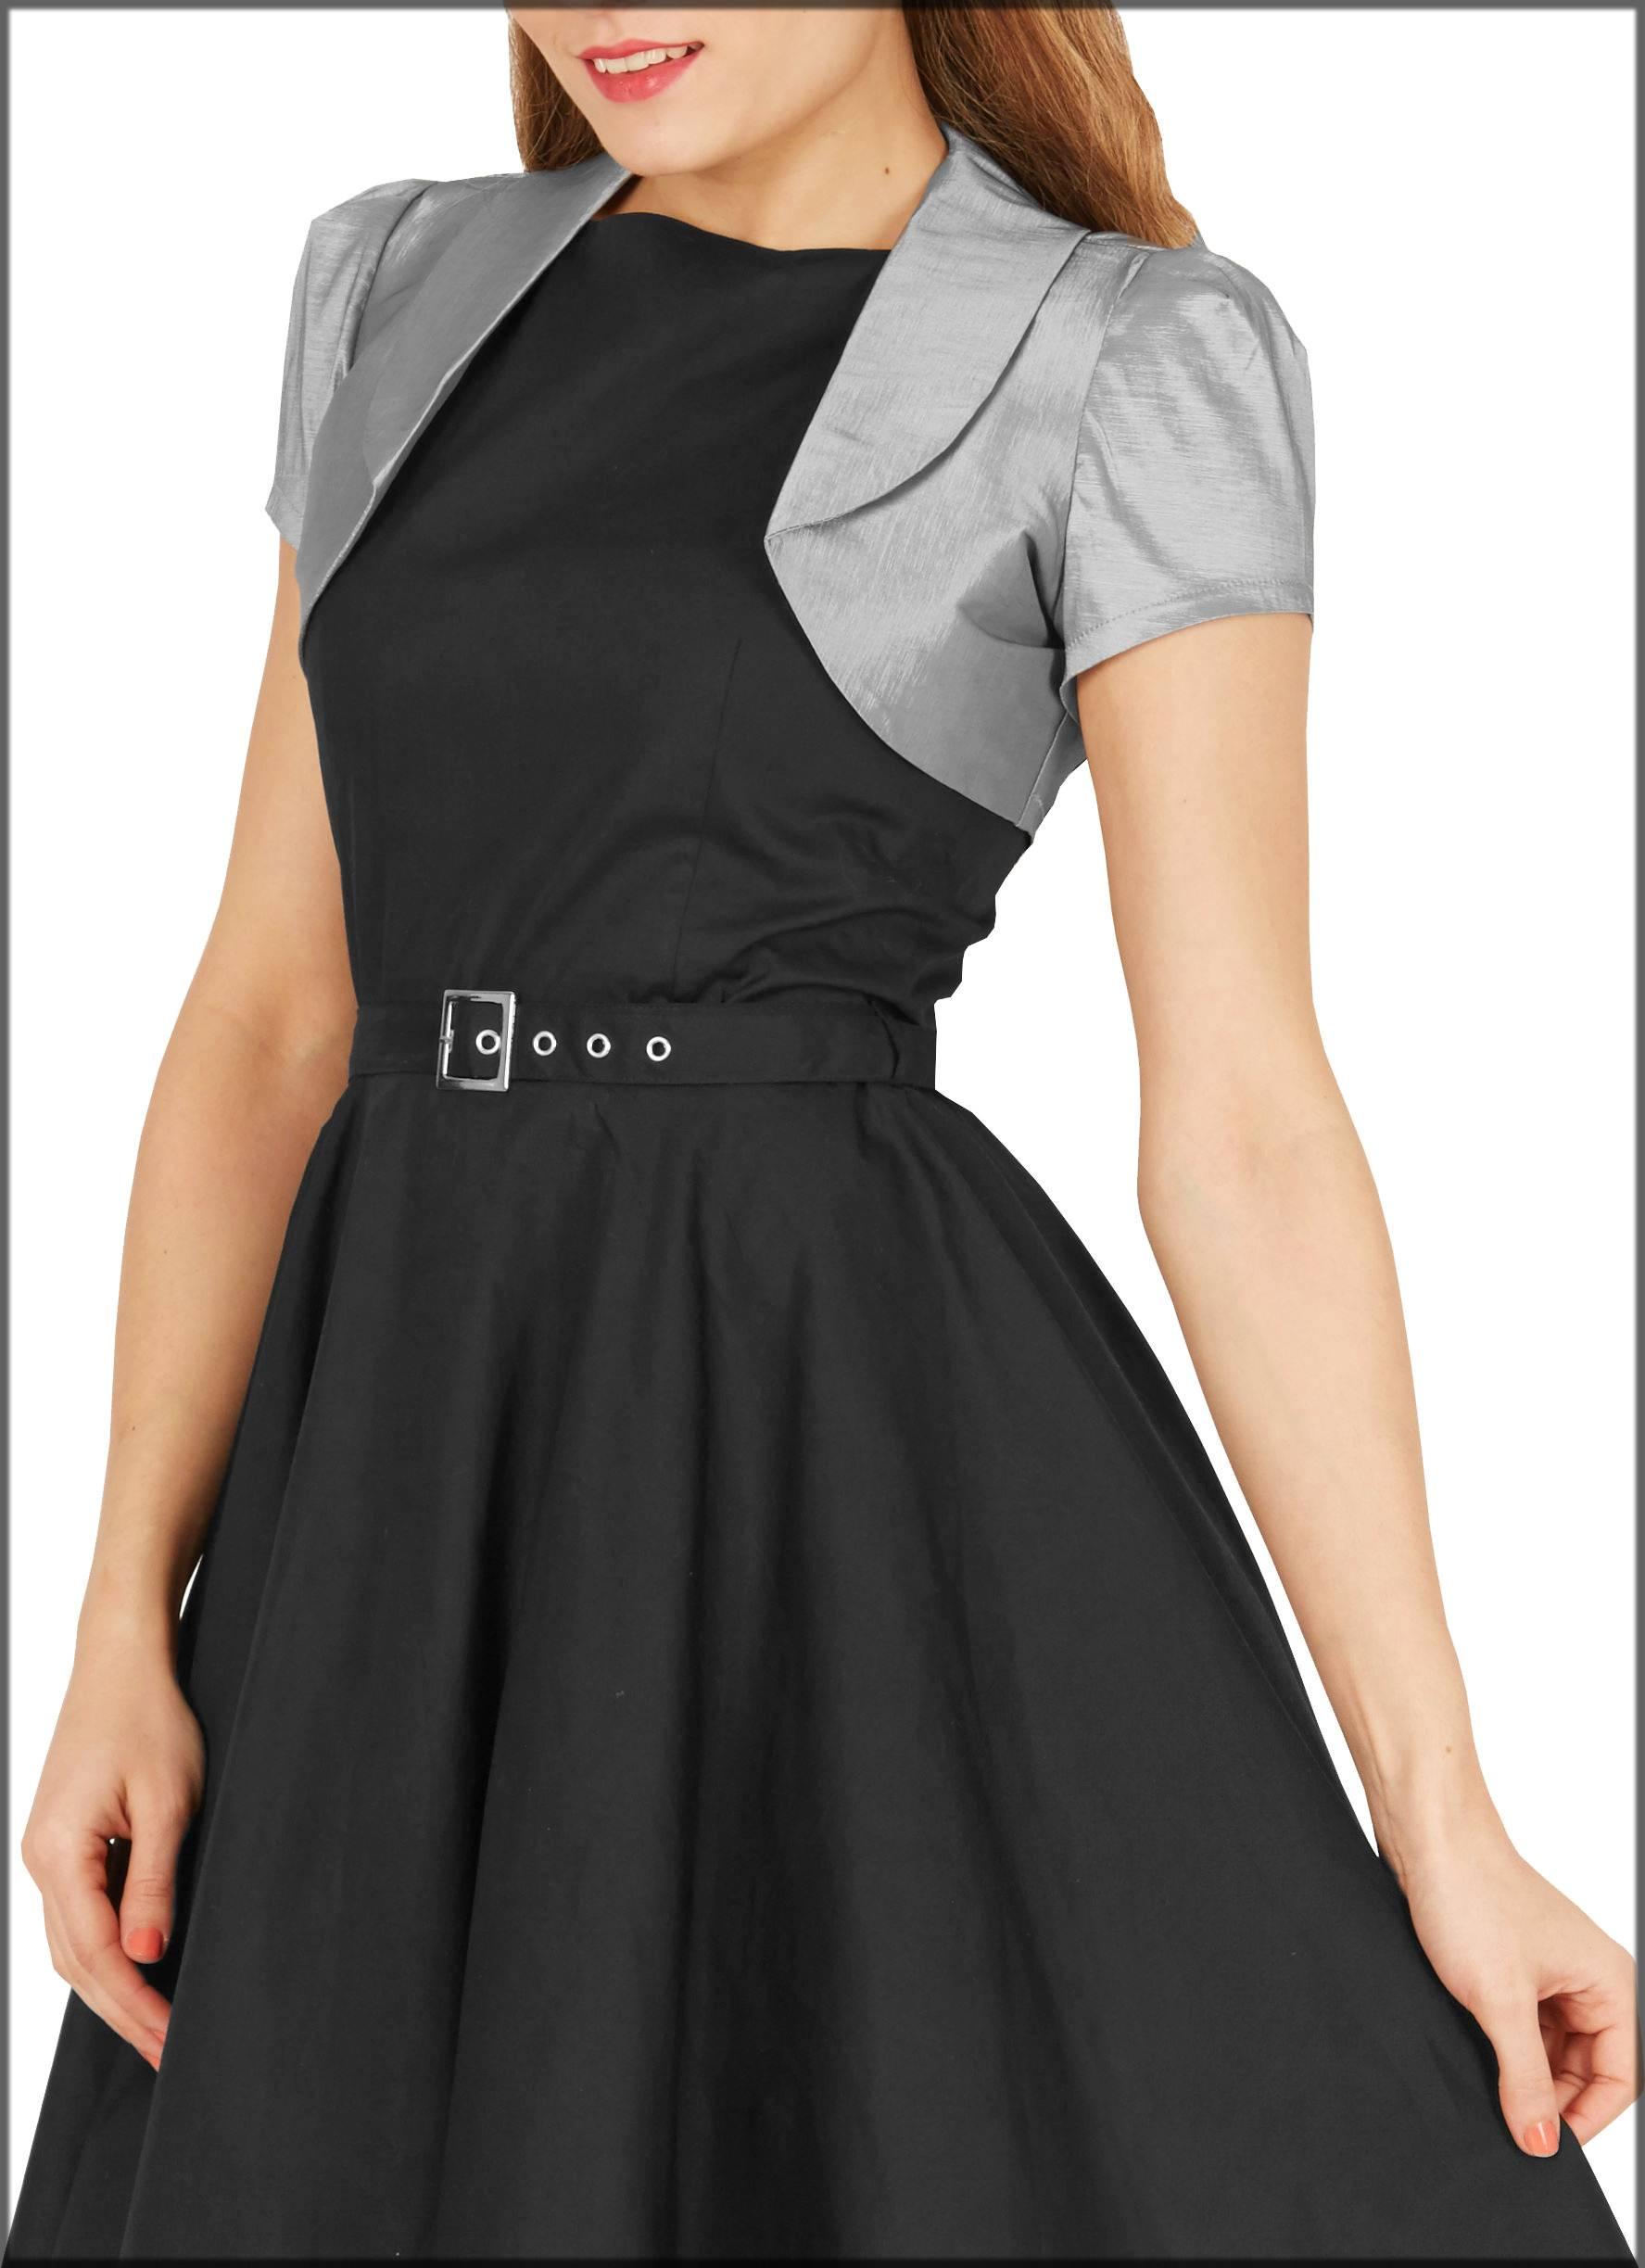 black-grey contrast jacket style frock